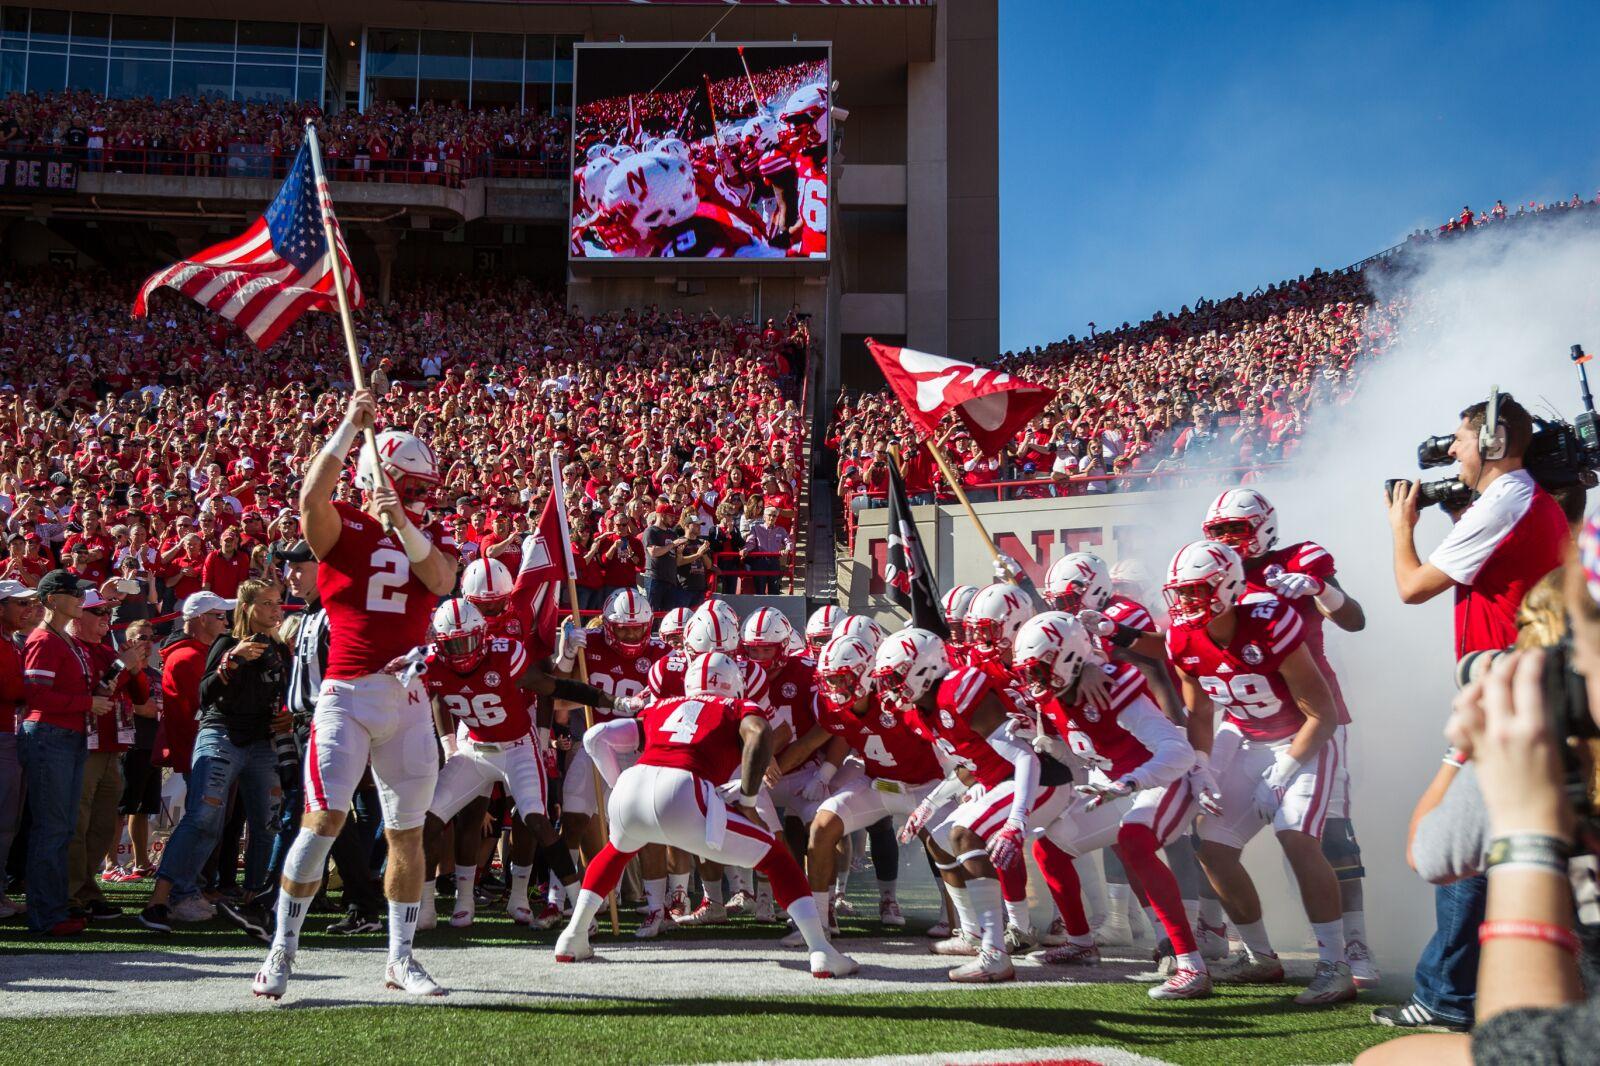 Wallpaper Scott Peterson: Nebraska Football: 3 Things To Watch Ahead Of Huskers